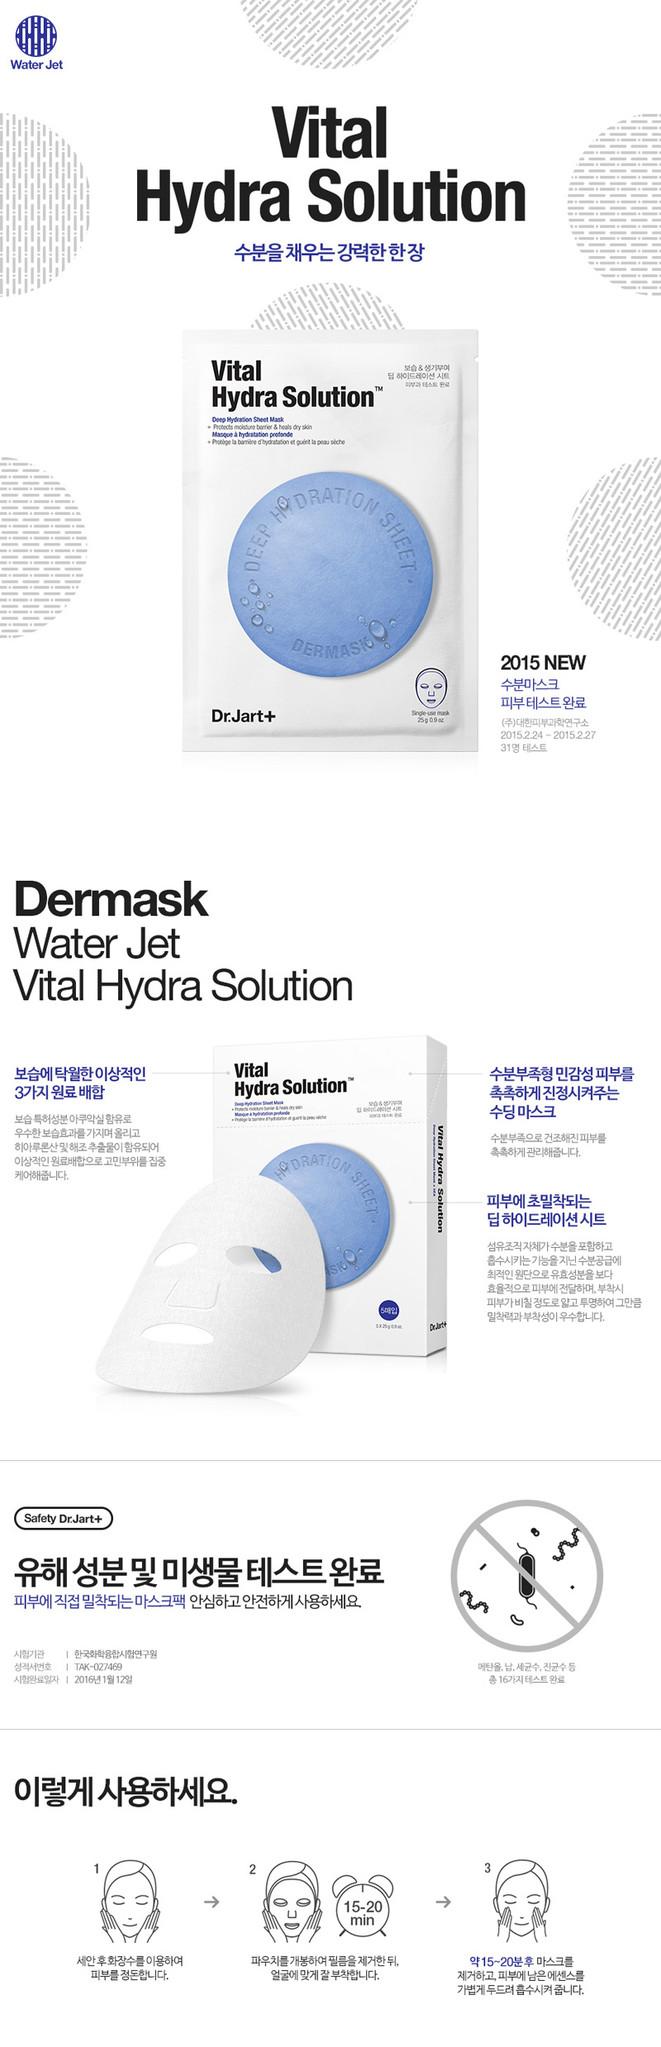 Dermask Water Jet Vital Hydra Solution-2